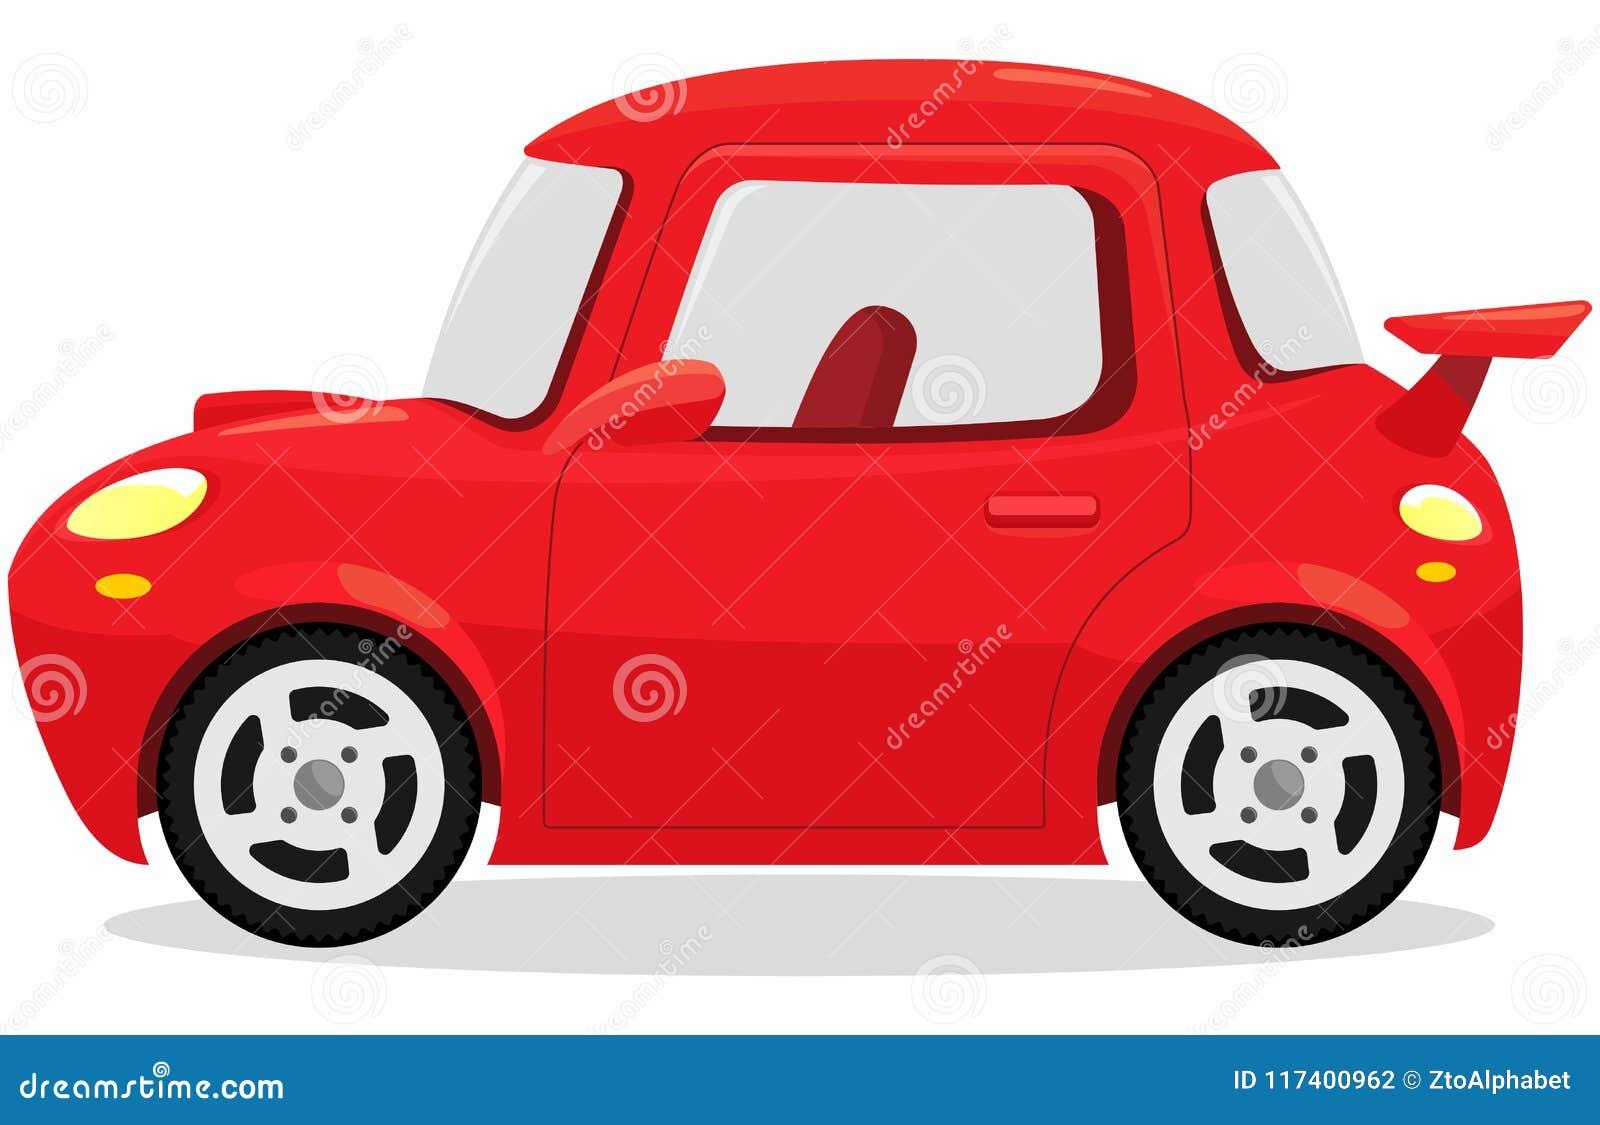 Sports Car Cartoon Concept Stock Vector Illustration Of Automobile